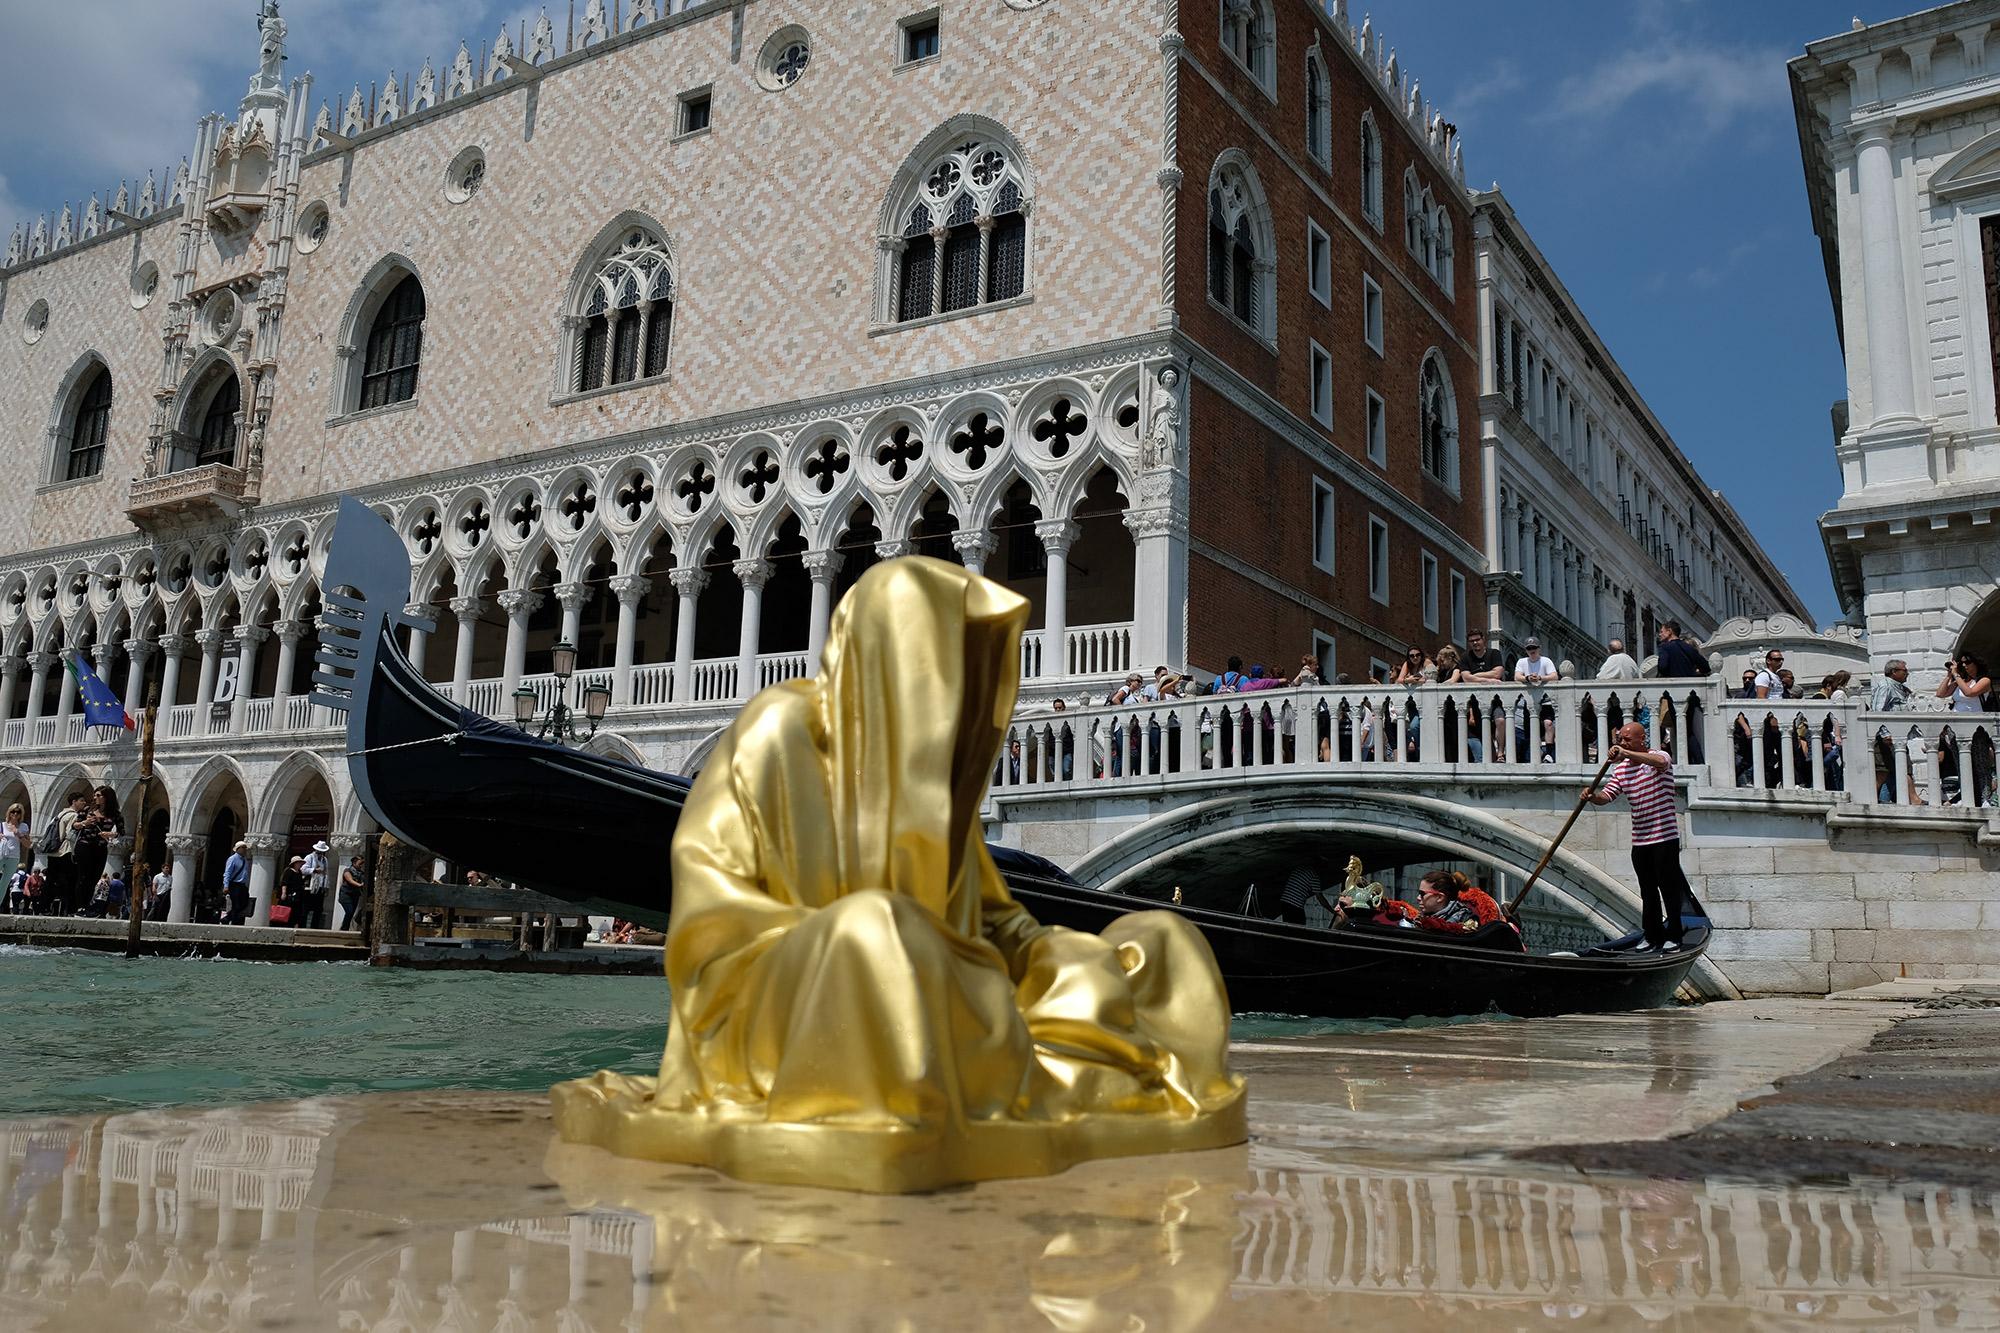 Biennale venezia venice artfair artbiennial for Artisti biennale venezia